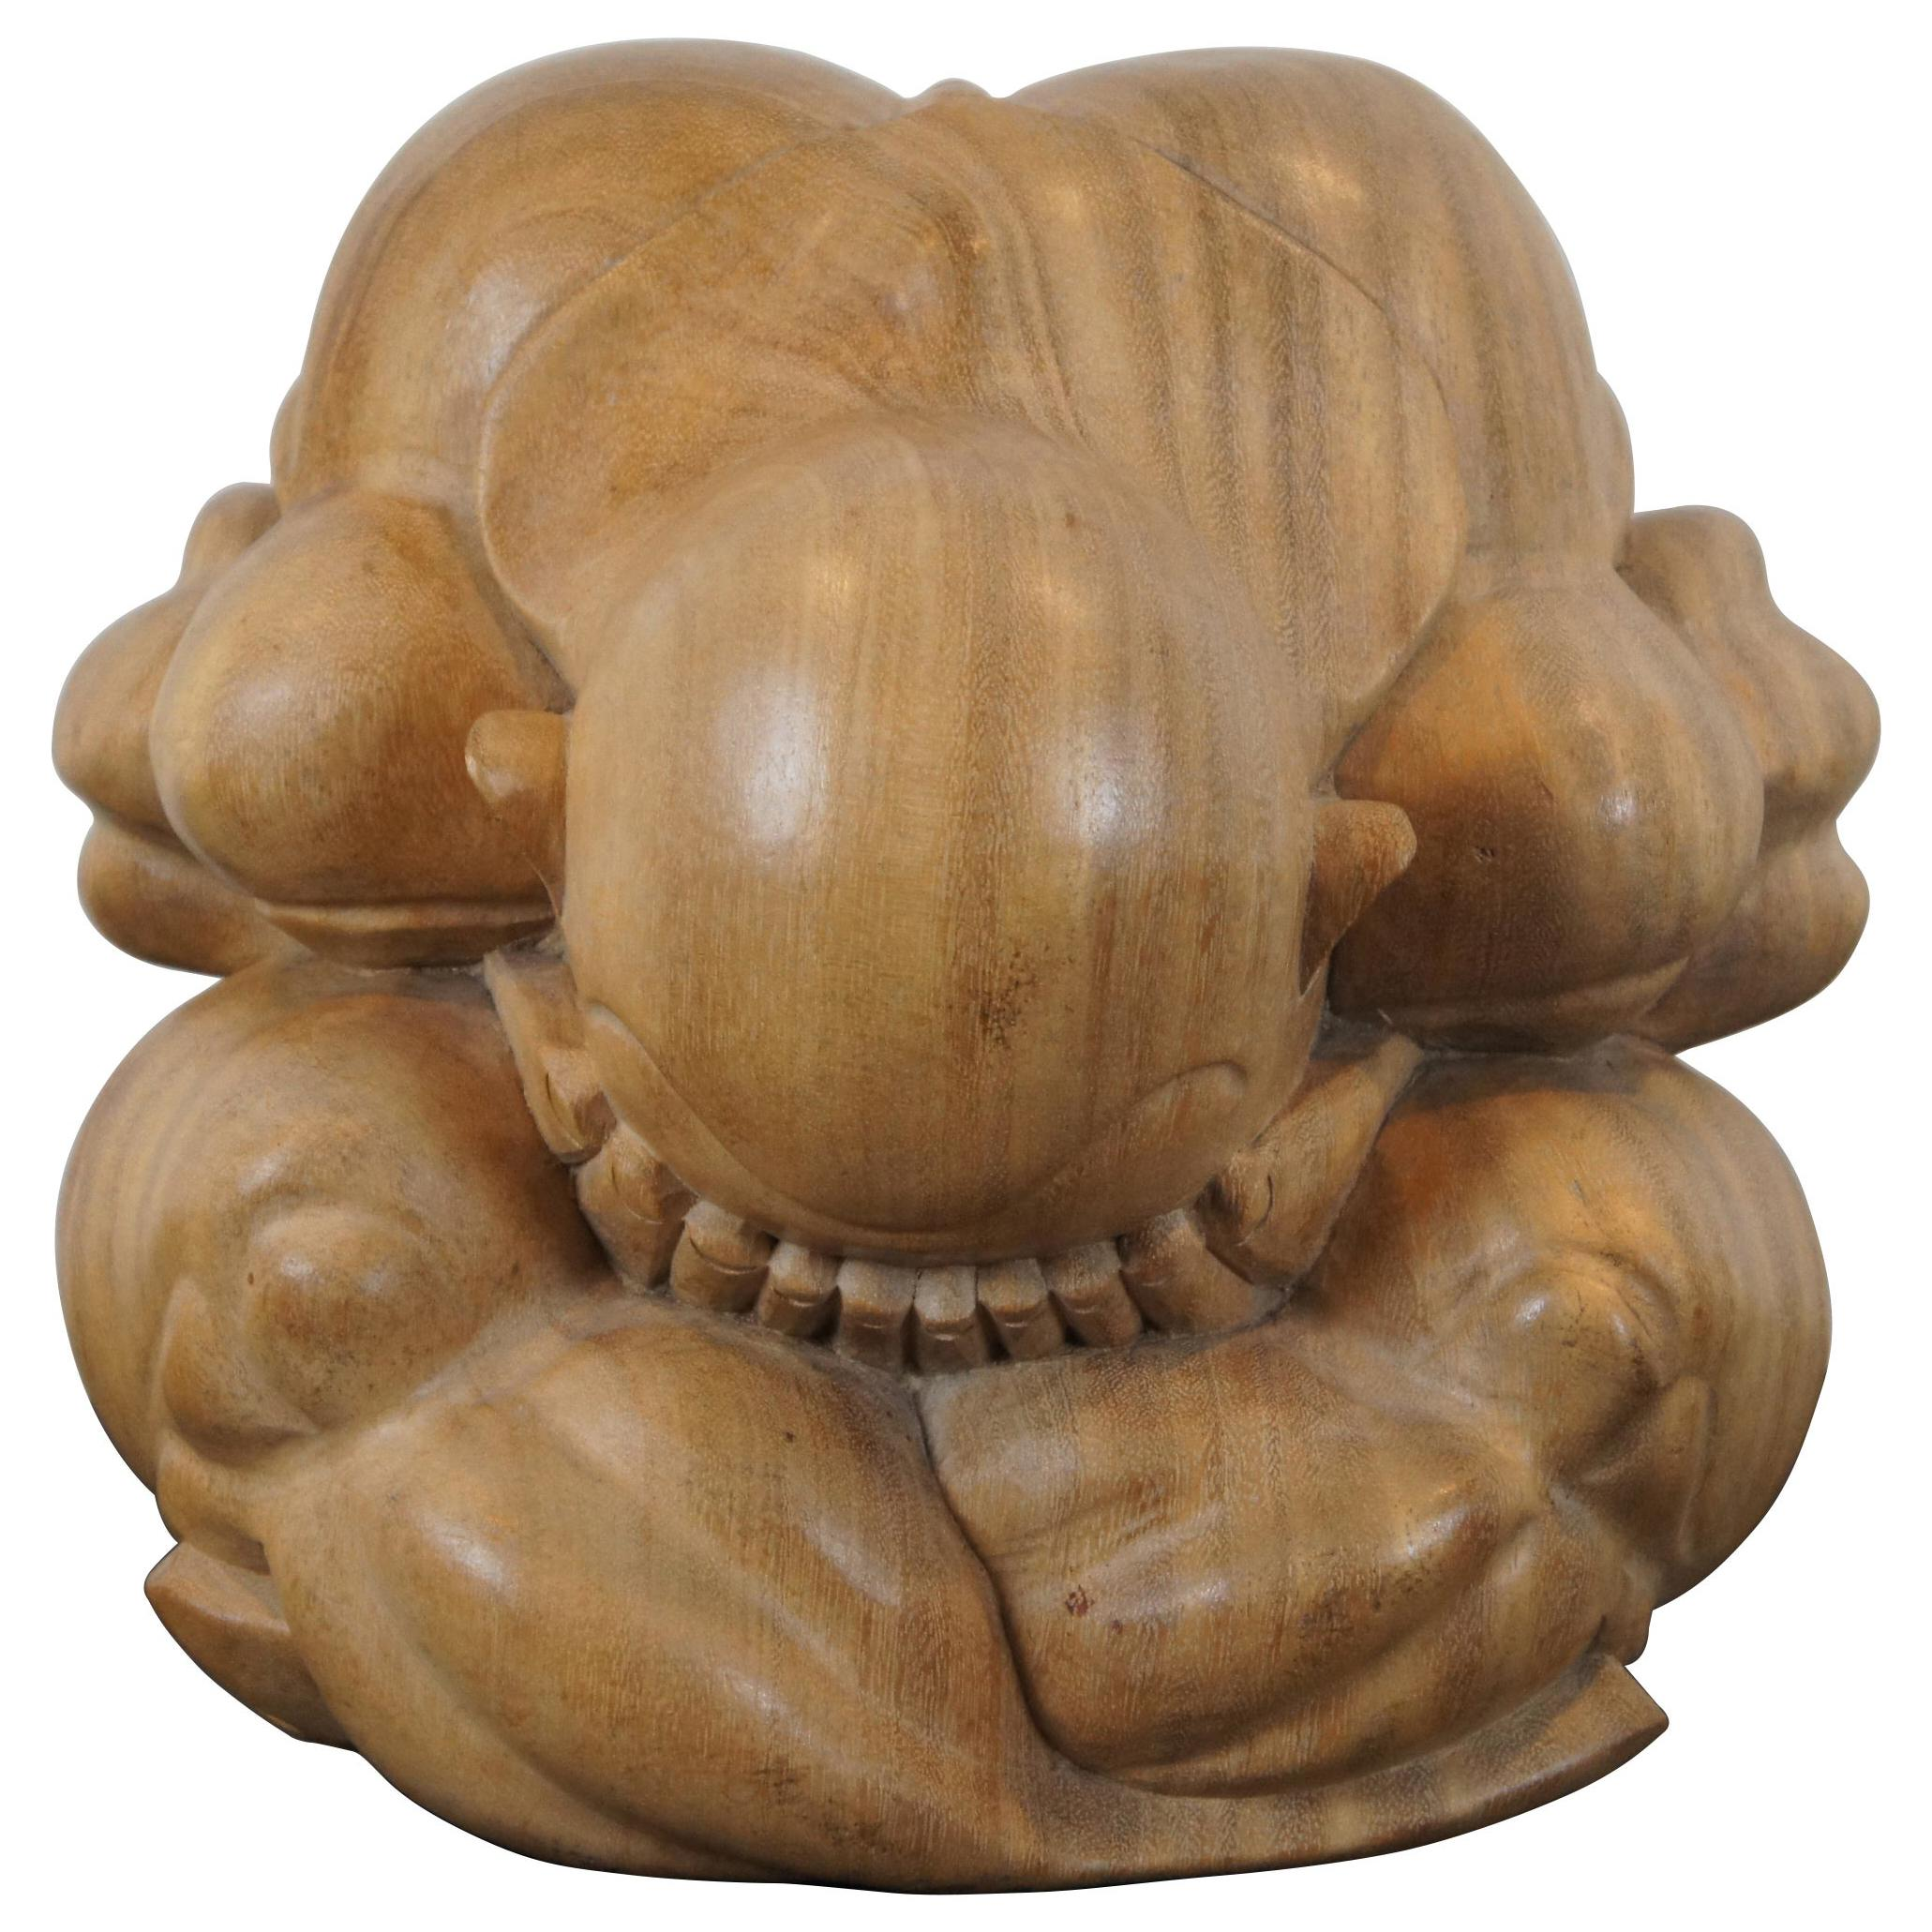 20th C Hand Carved Teak Weeping Buddha Figure Sculpture Crying Monk Yogi